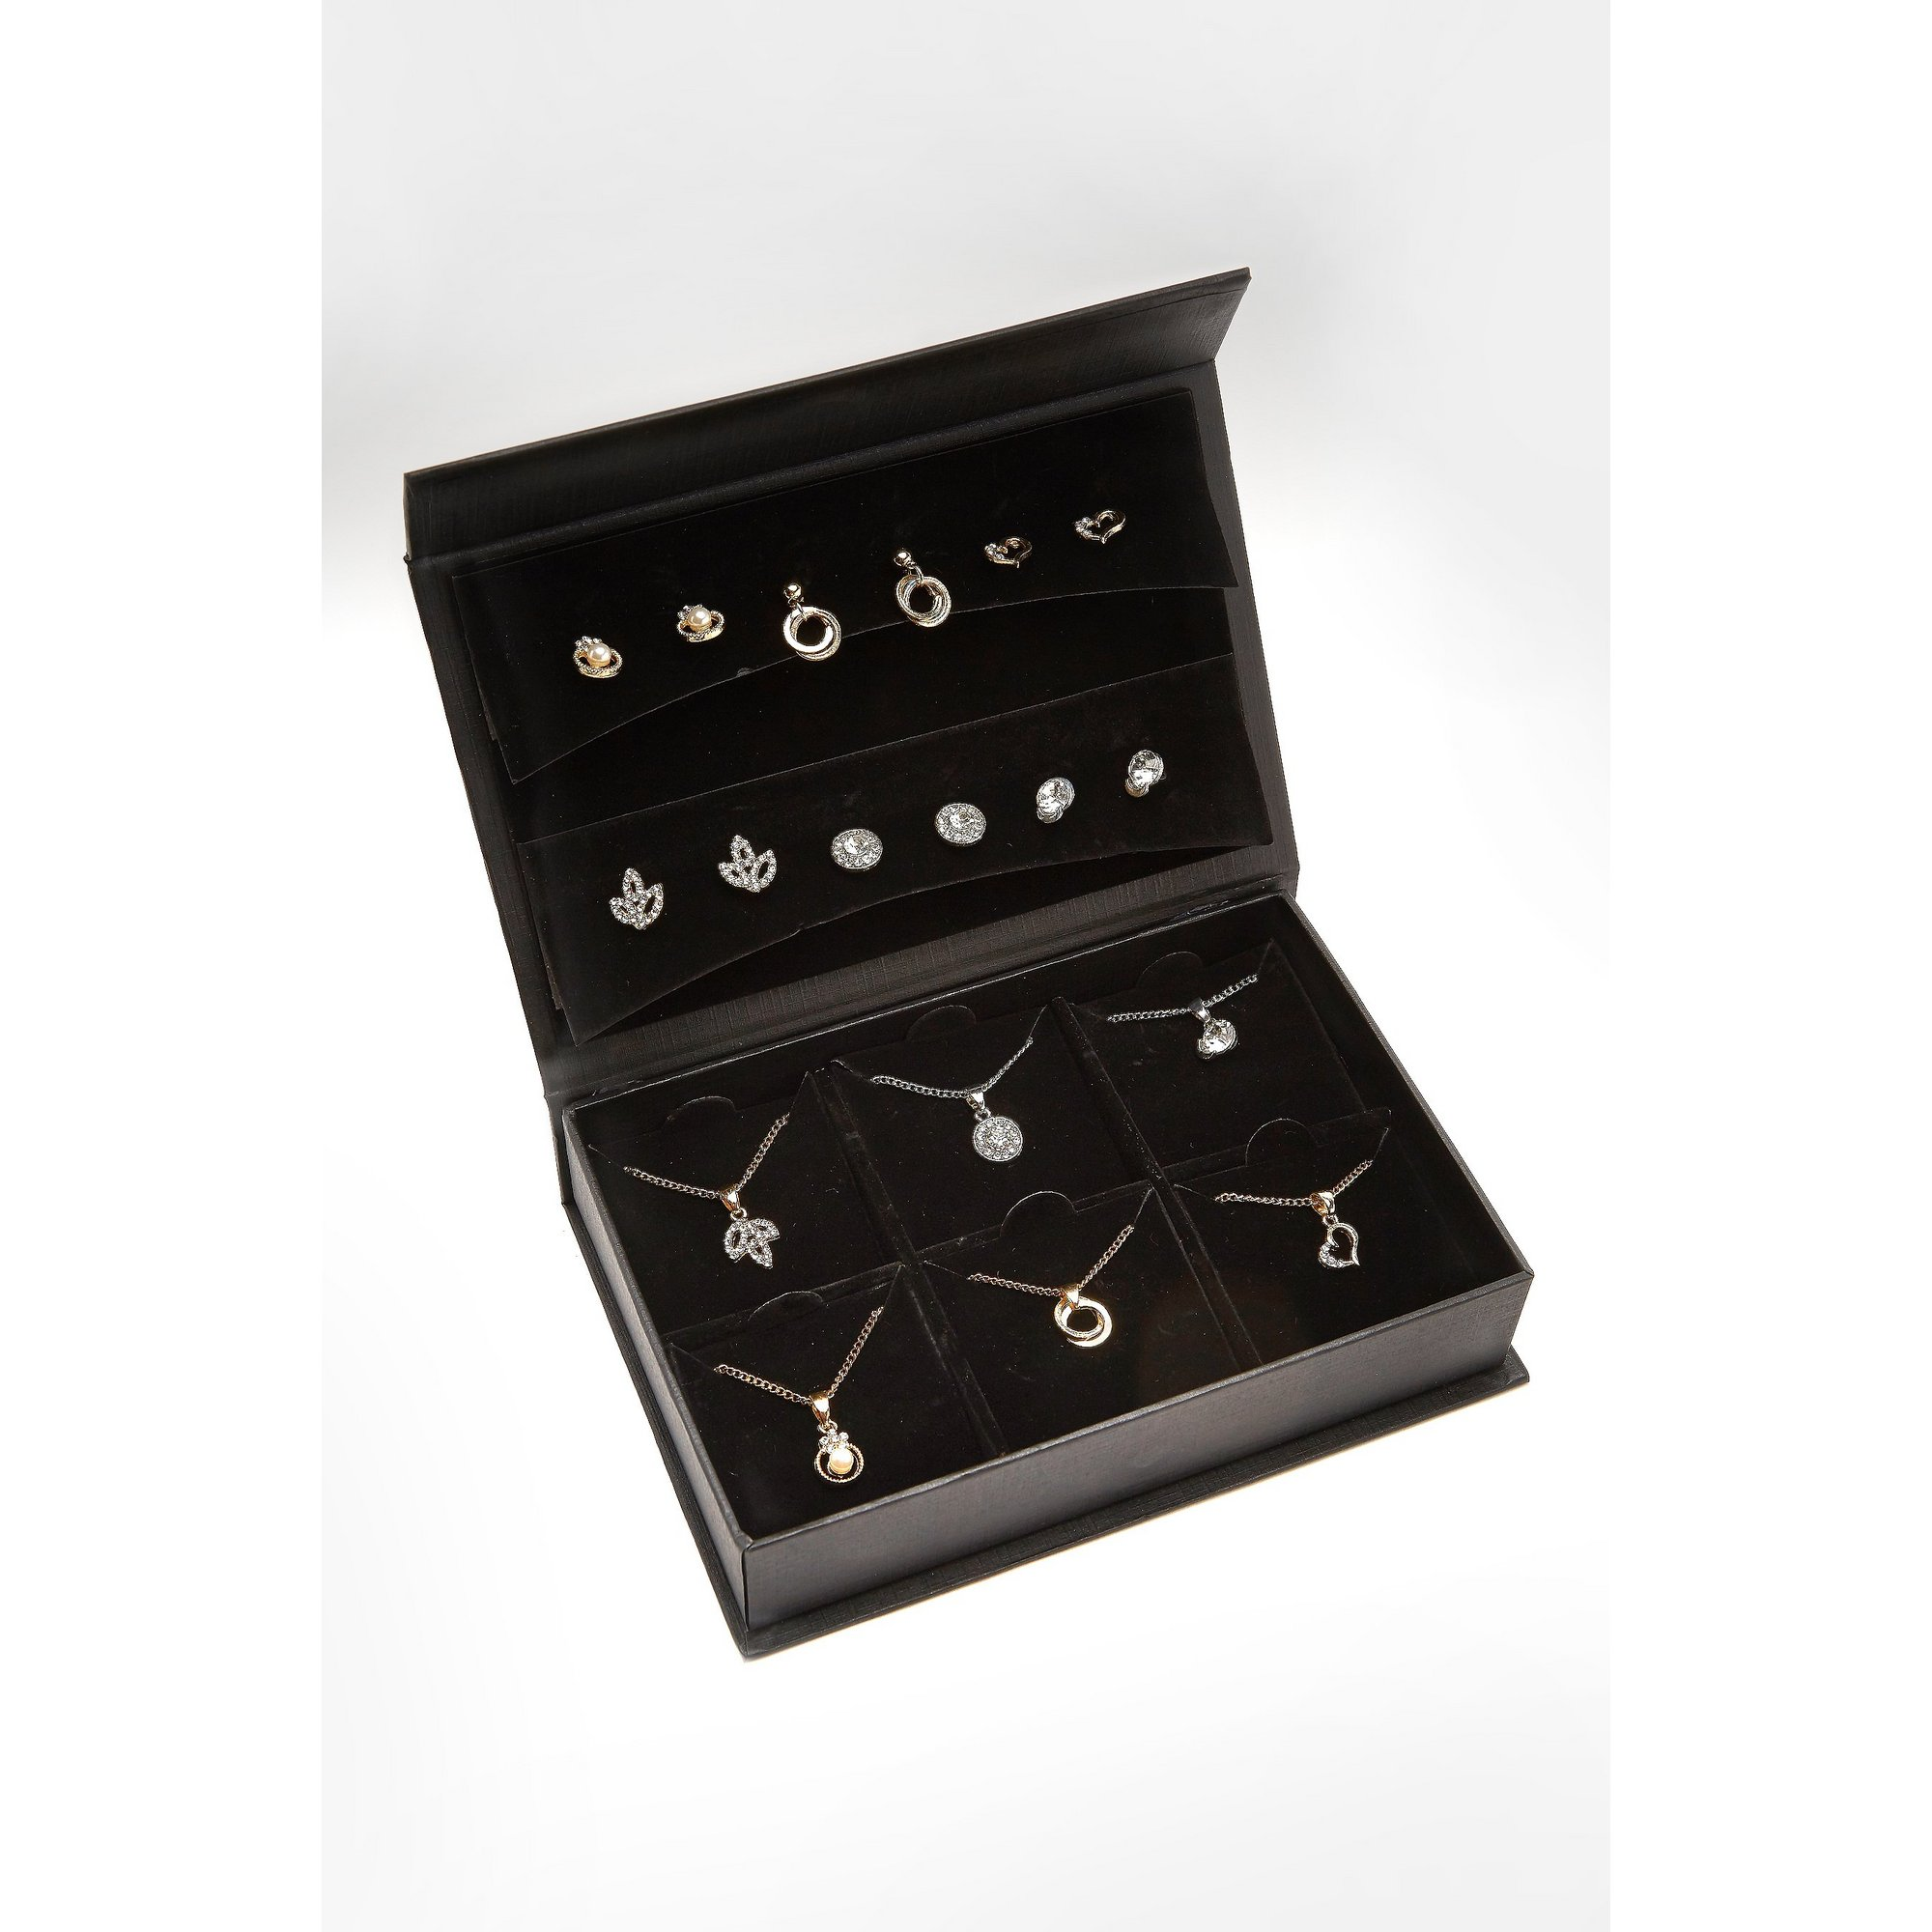 Image of Black Jewellery Box